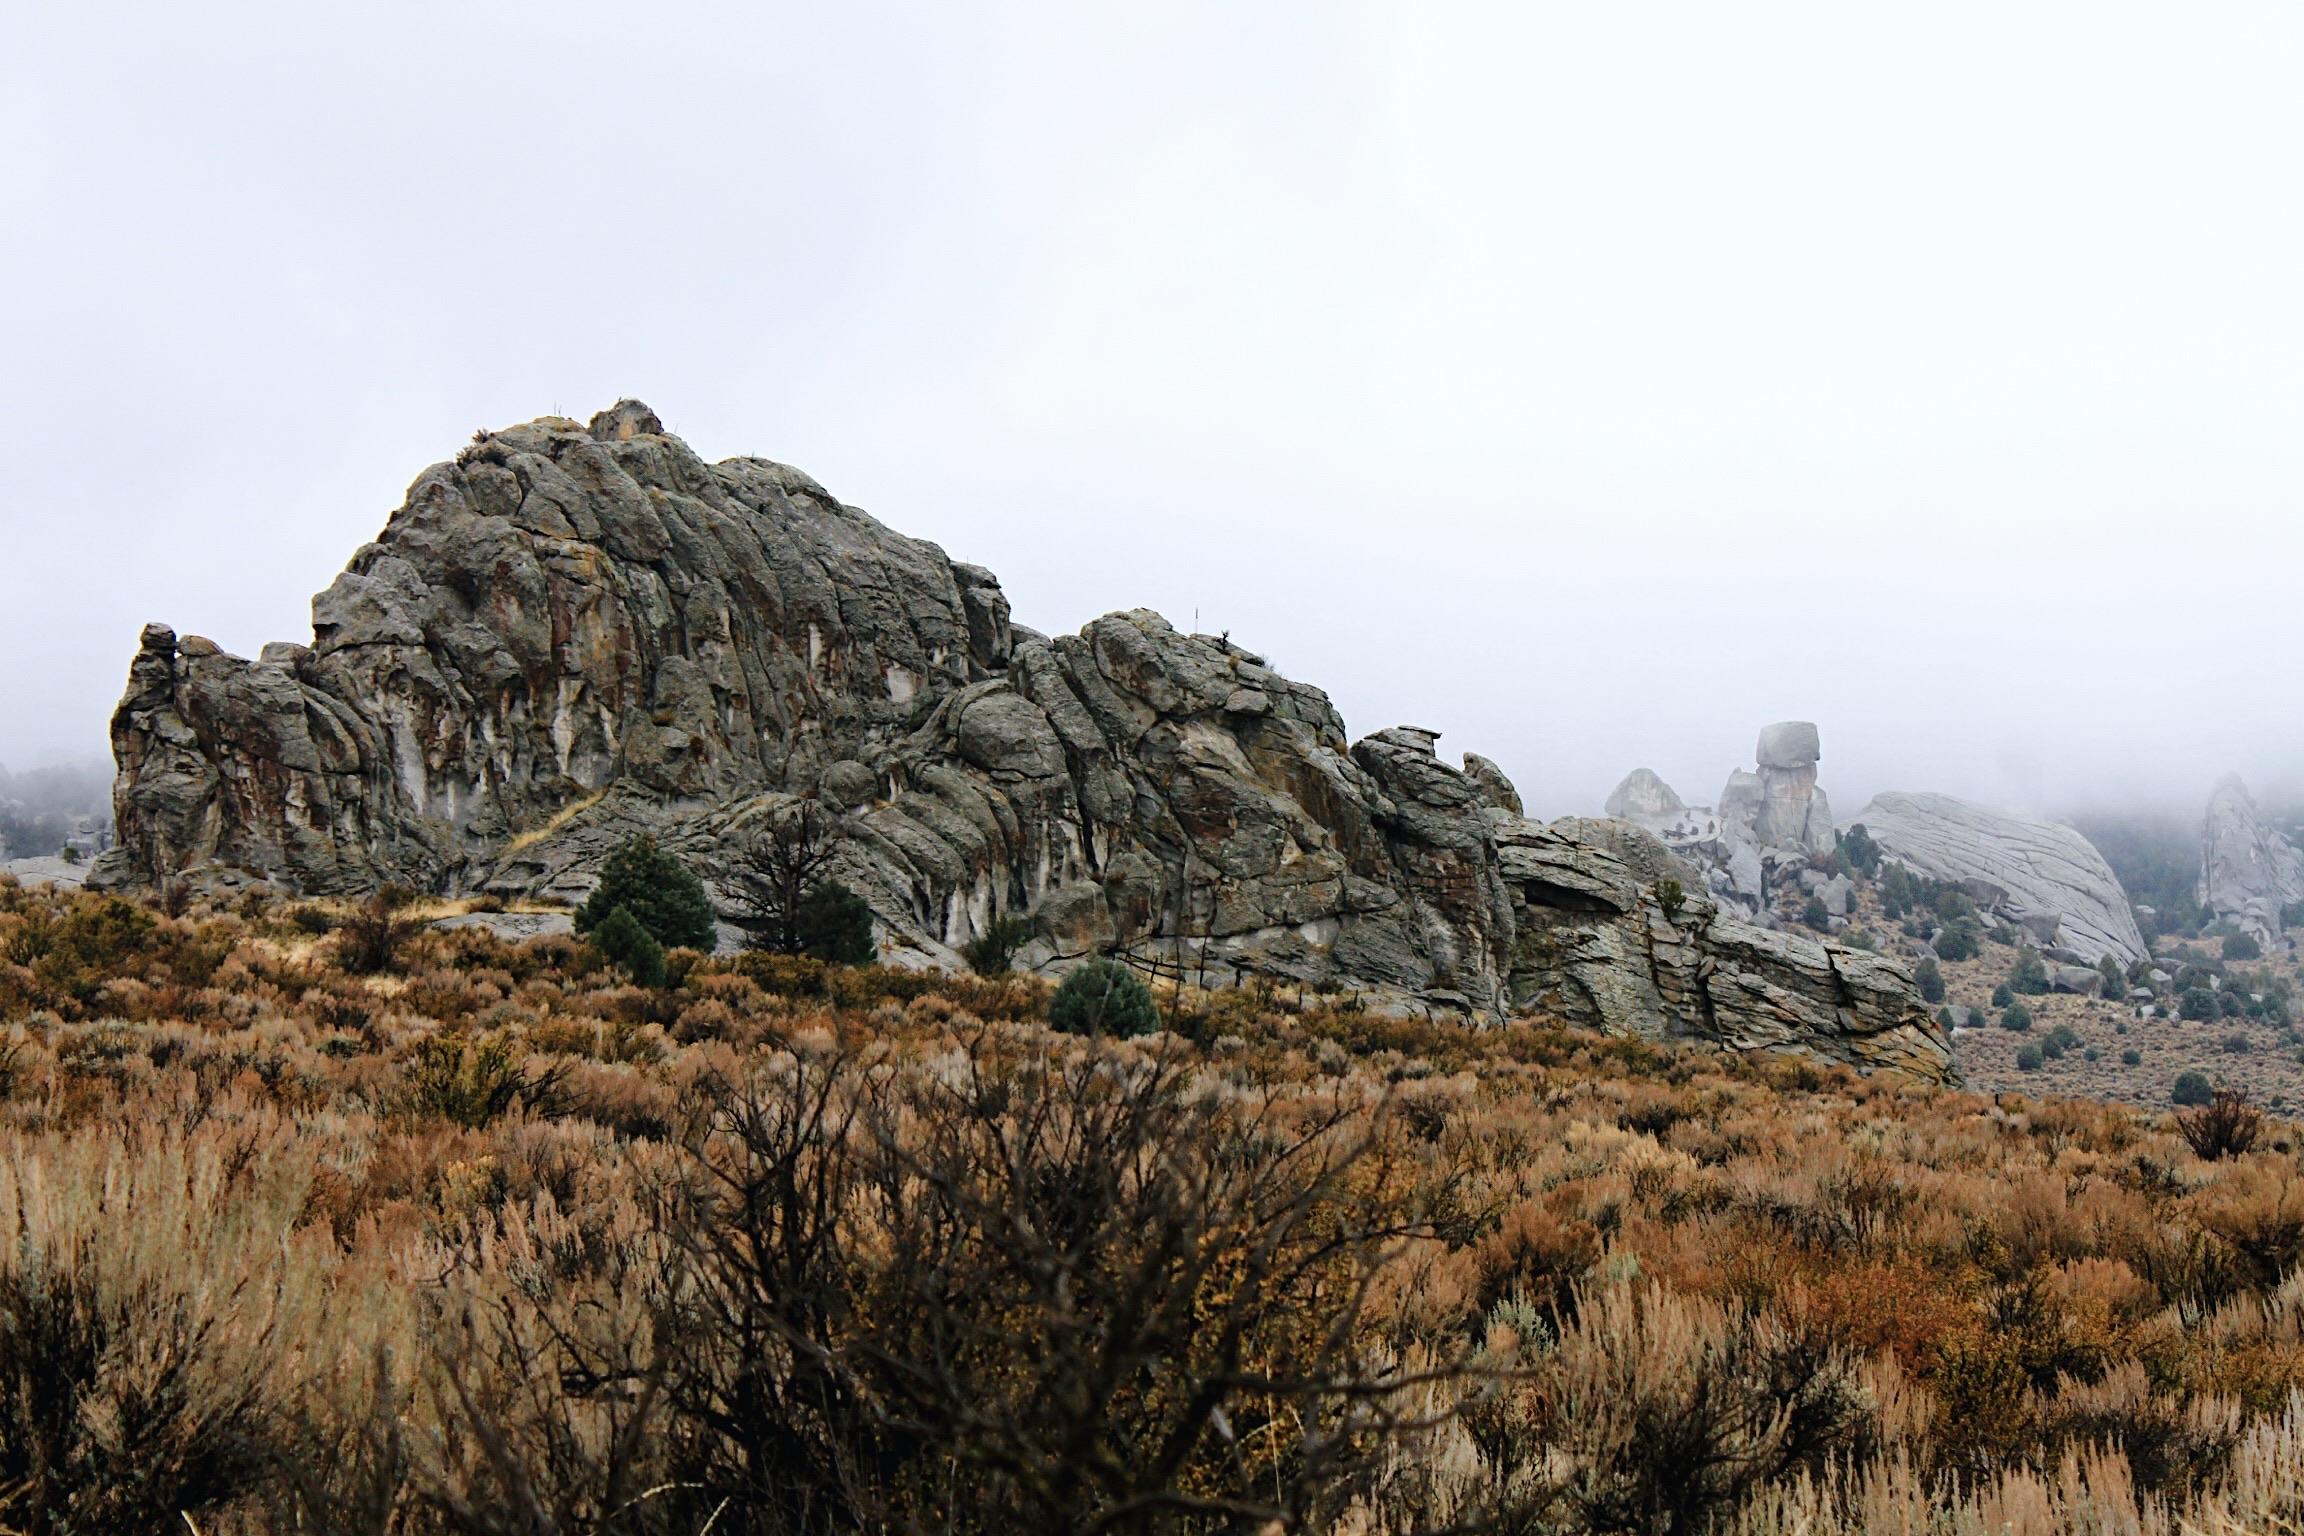 City of Rocks National Reserve || Malta, Idaho || beauty, nature, settlement, immigration, wonder, majestic